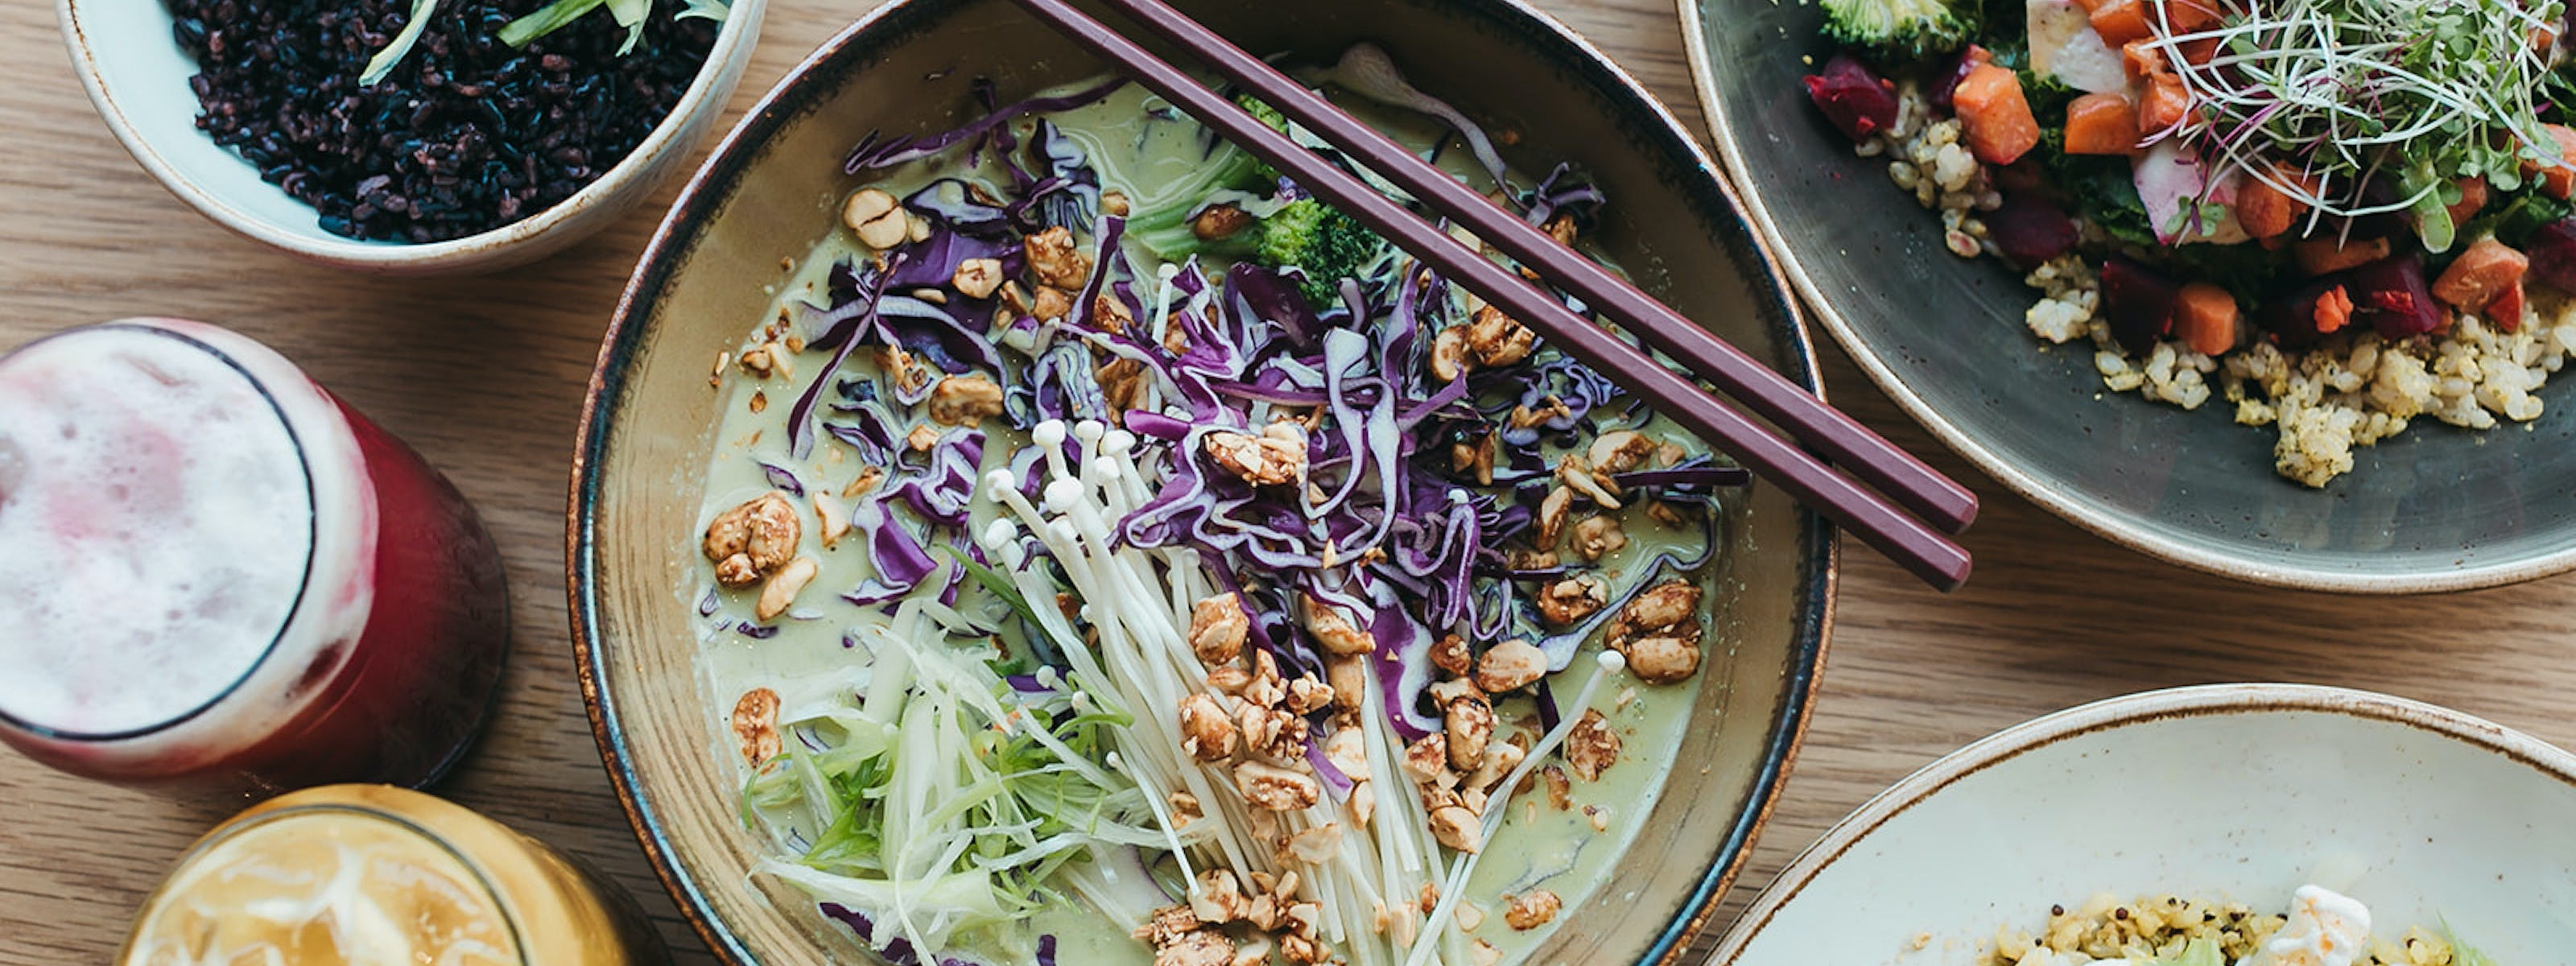 The Boston Vegetarian & Vegan Delivery Guide - Boston - The Infatuation